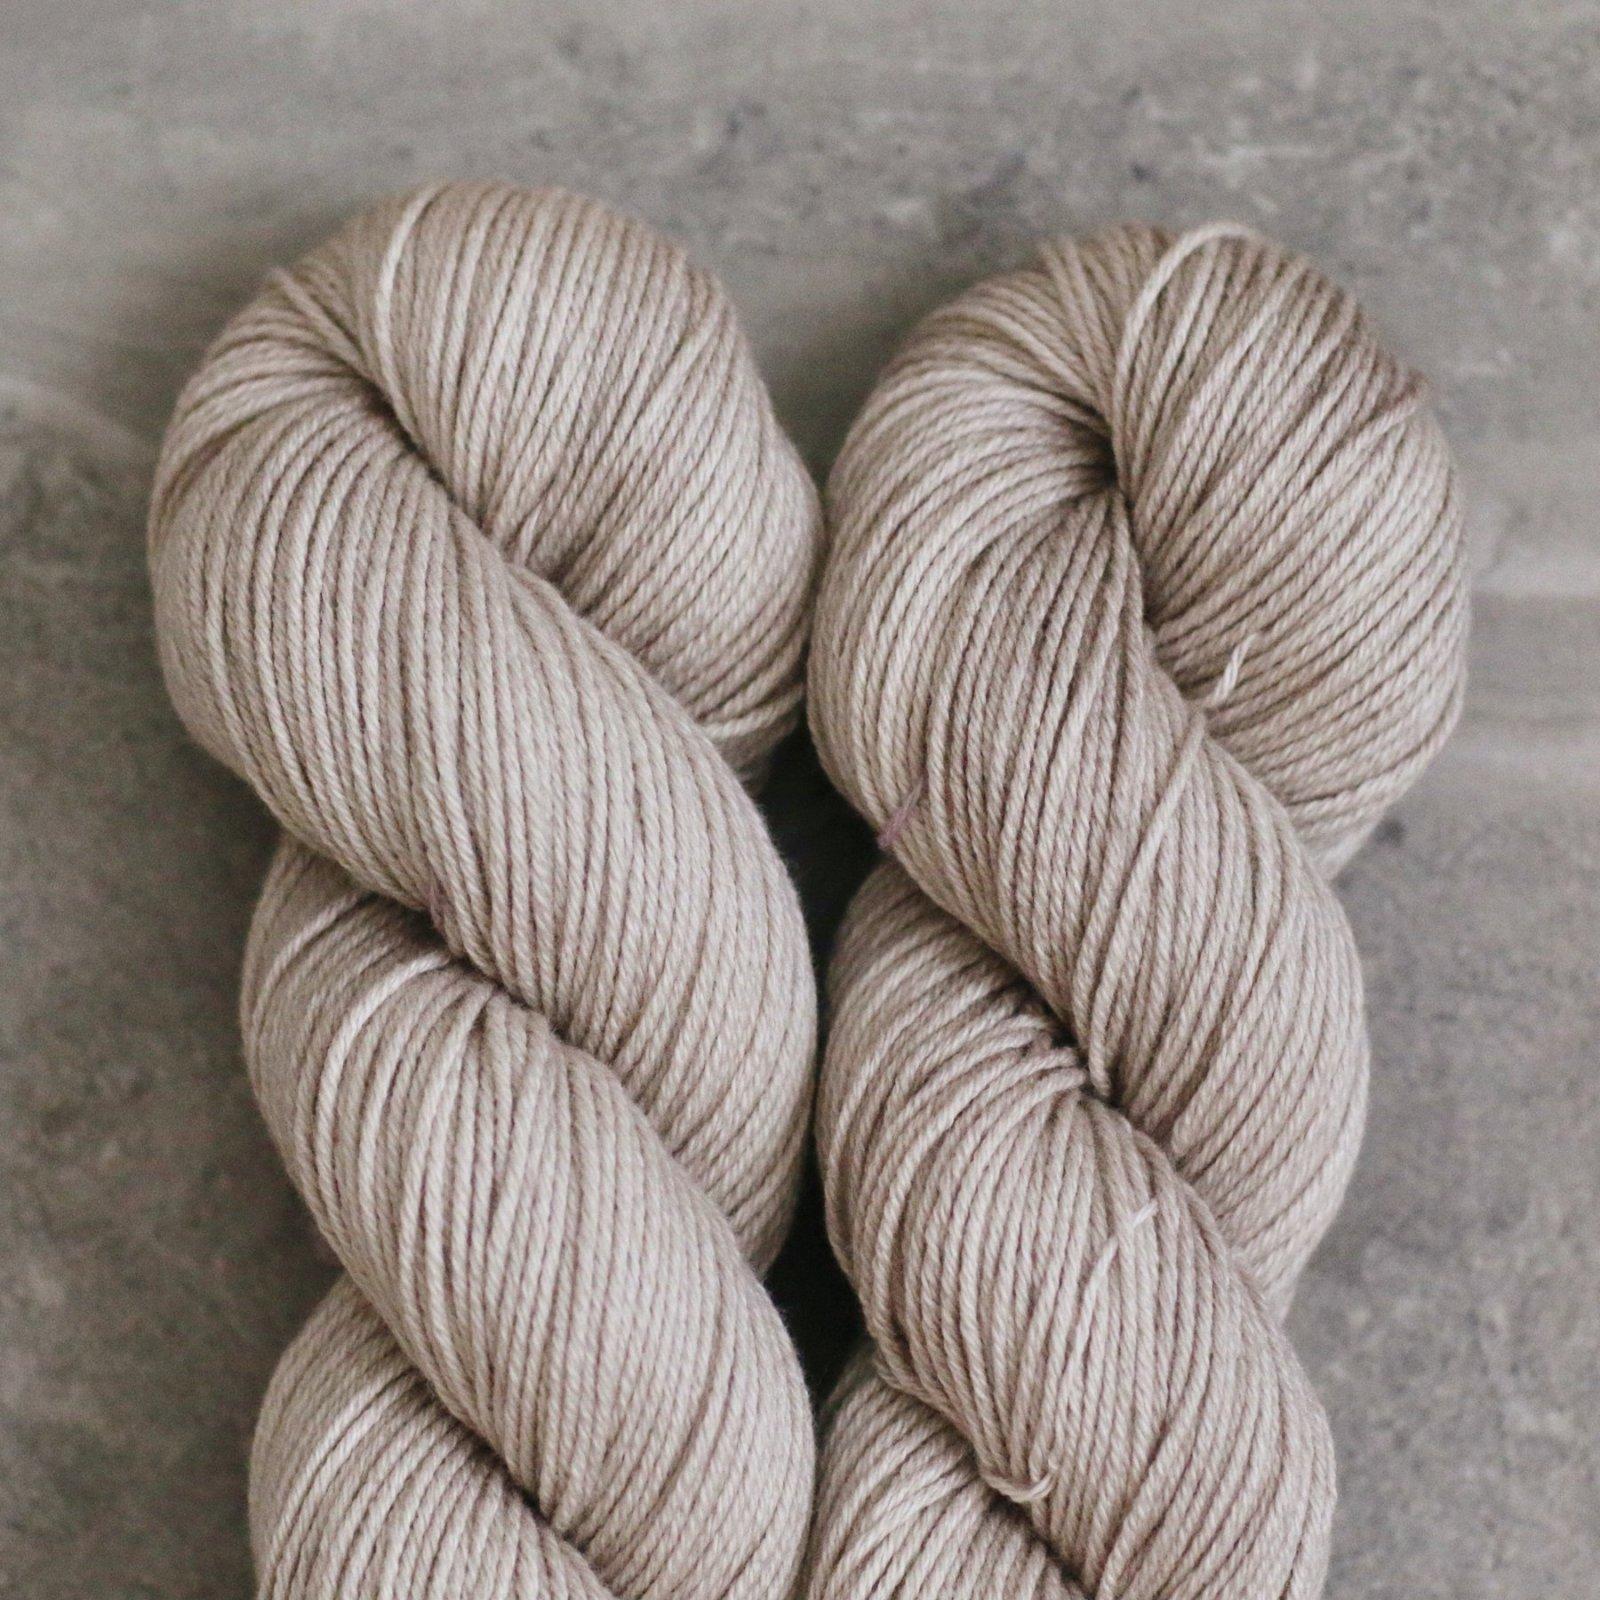 Tosh Wool + Cotton